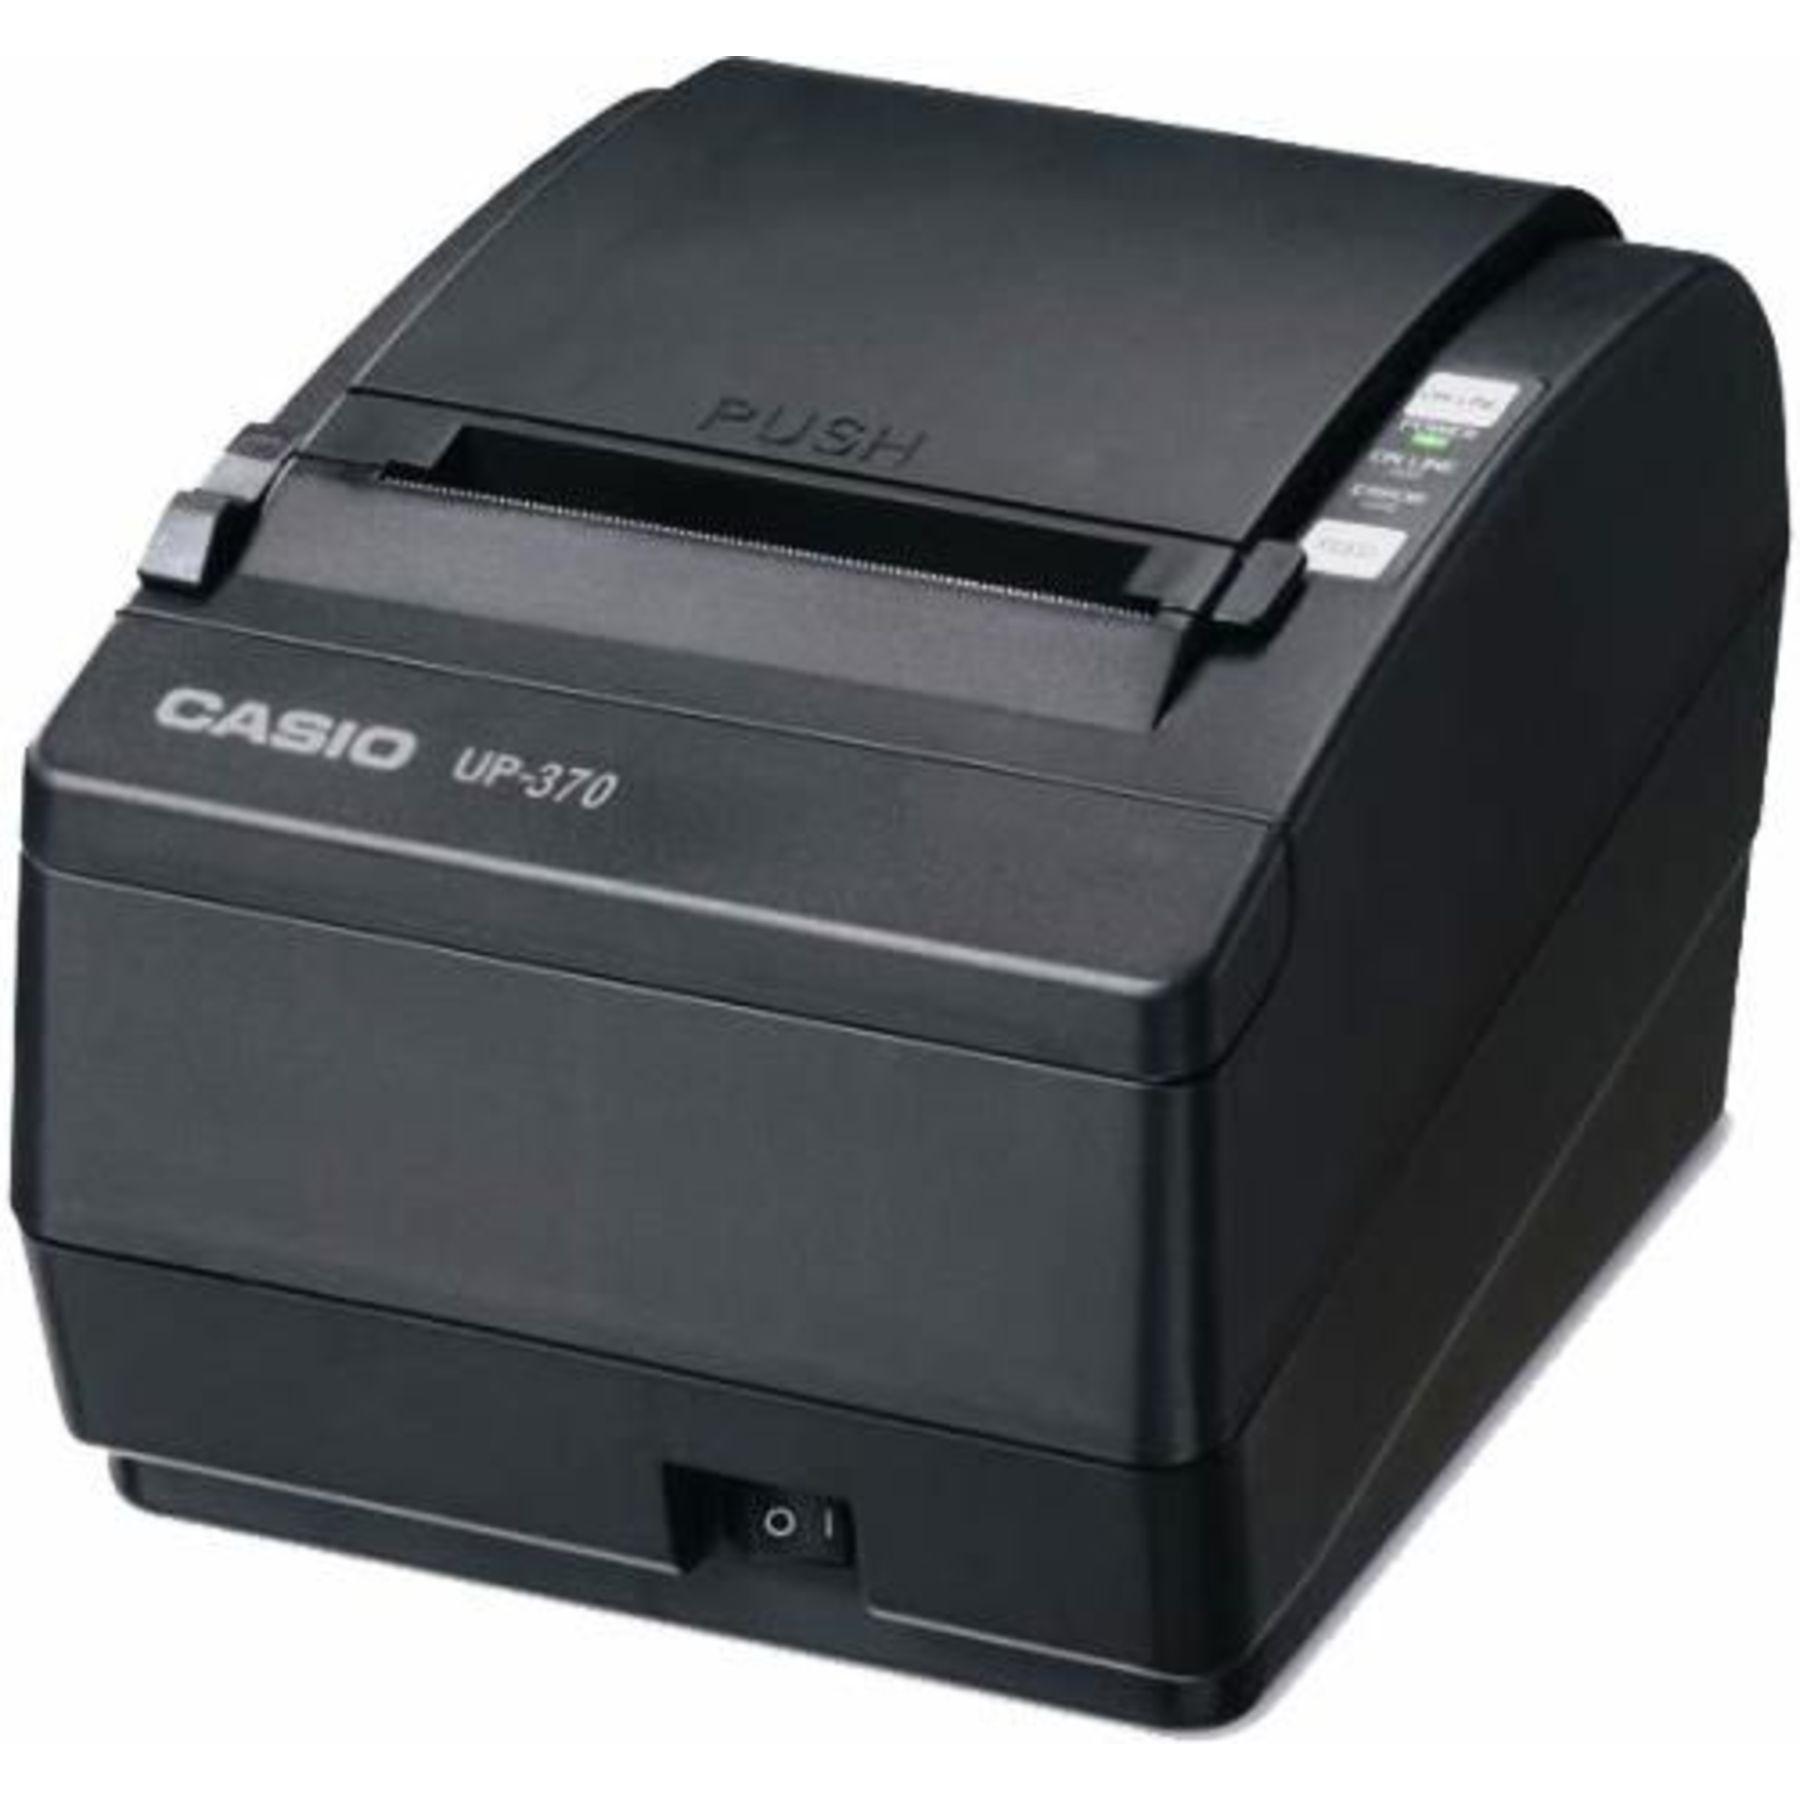 Casio Up 370 Thermal Receipt Printer Cash Drawers Ireland